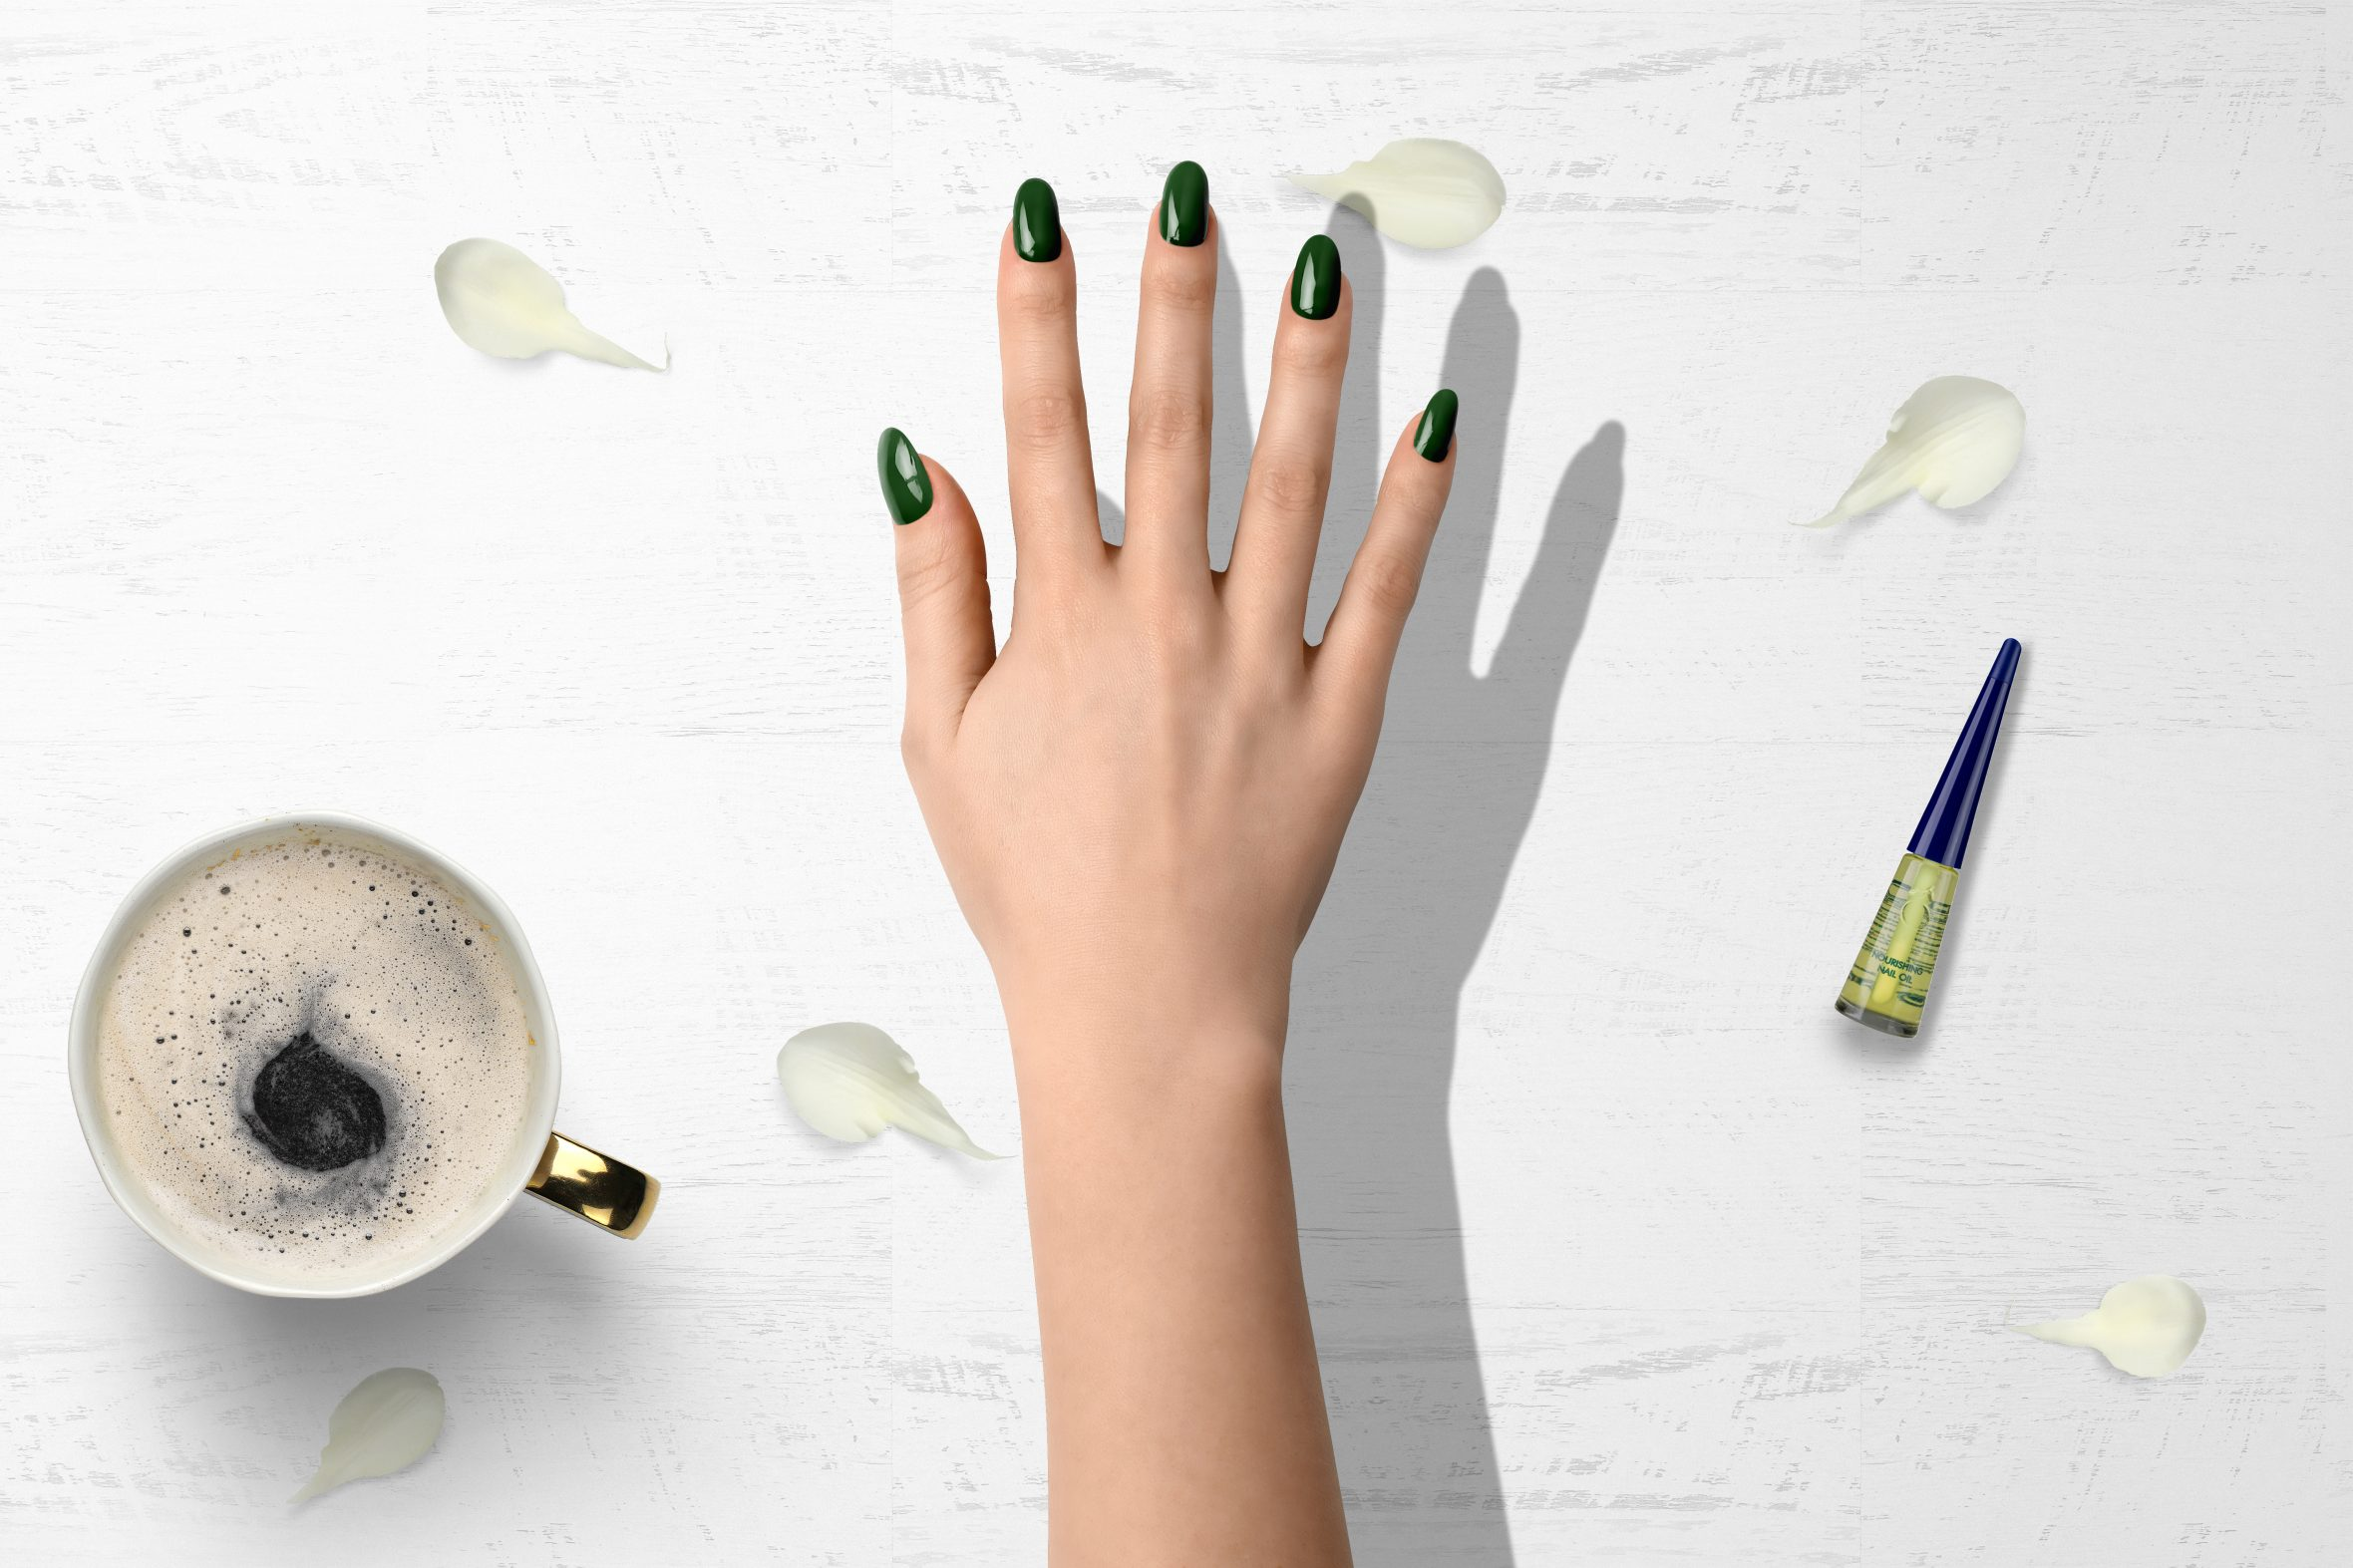 Donkergroene nagellak voor je trendy manicure